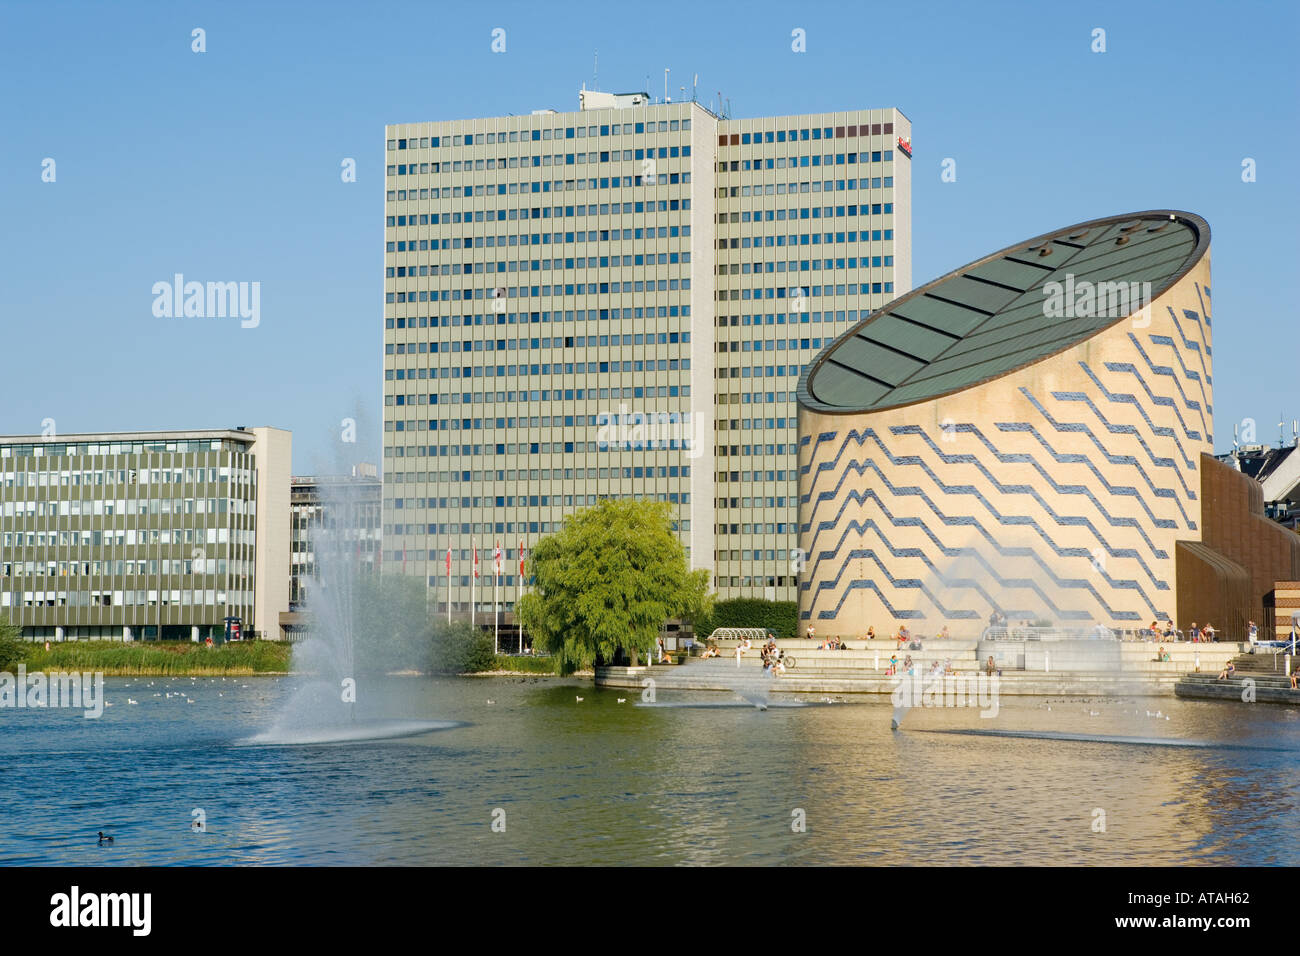 Copenhagen Denmark Scandic Hotel building centre and Tycho Brahe Planetarium right on Sankt Jorgens So - Stock Image